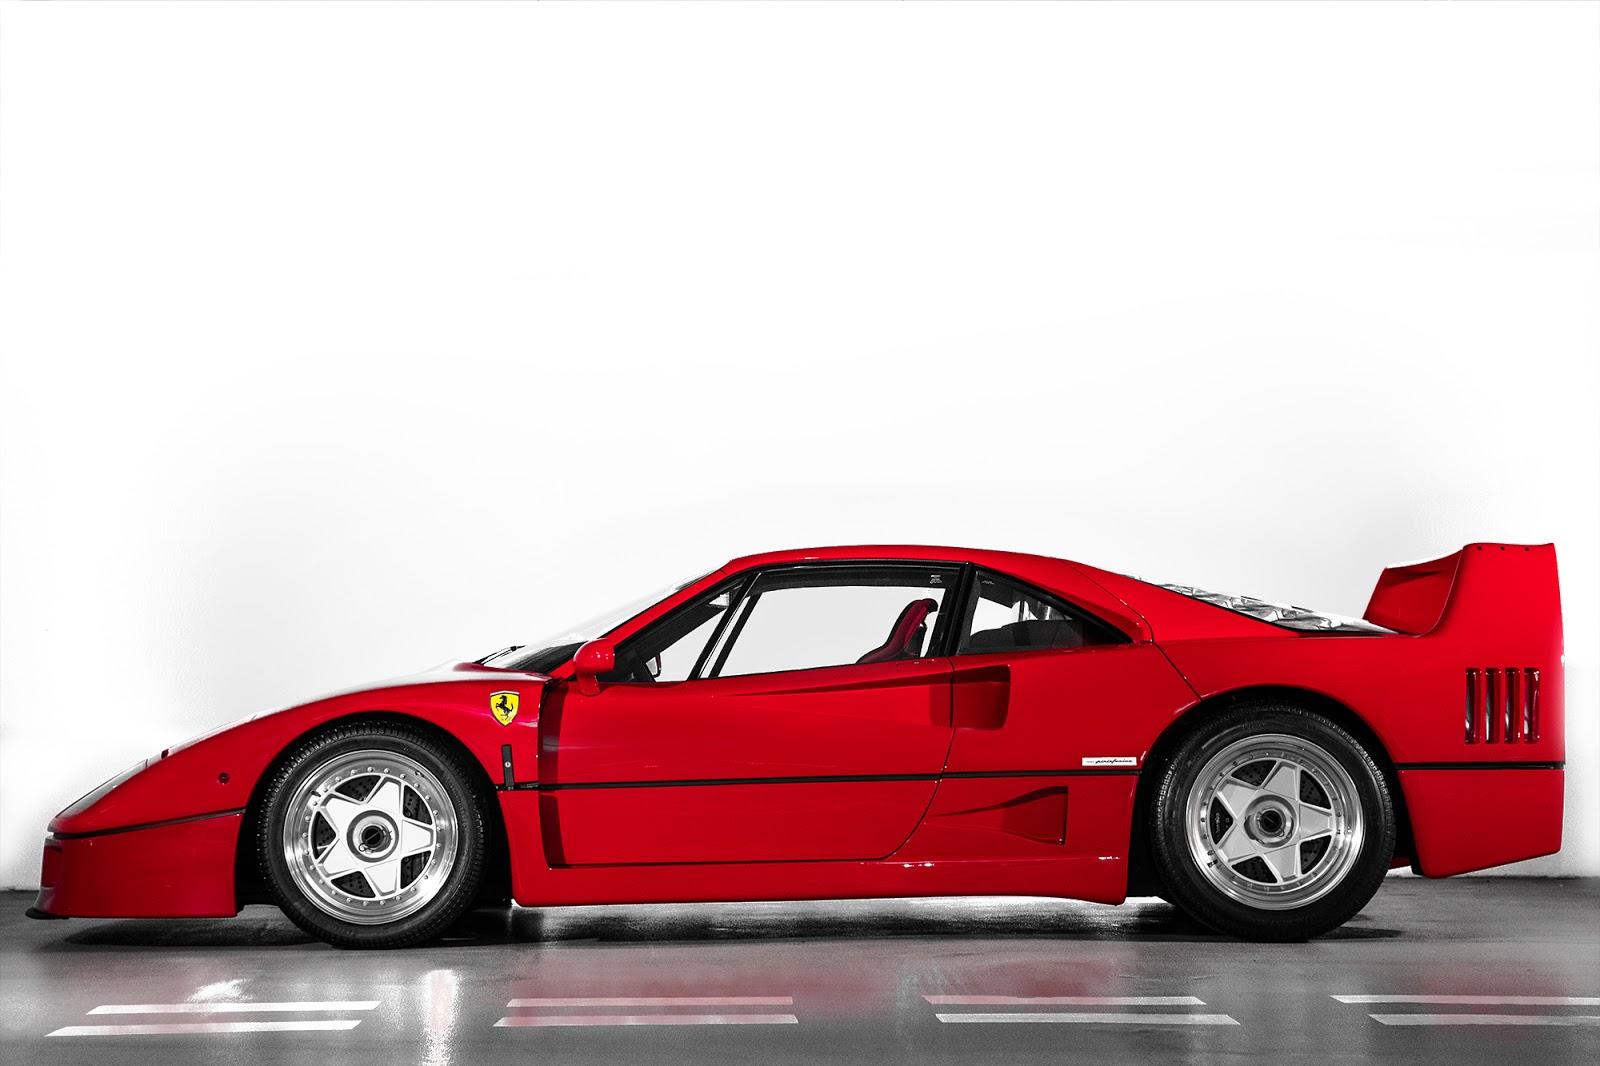 MK5 4842 F40. O μύθος, ο θρύλος F40, Ferrari, Ferrari F40, retrocar, retrocar sunday, zblog